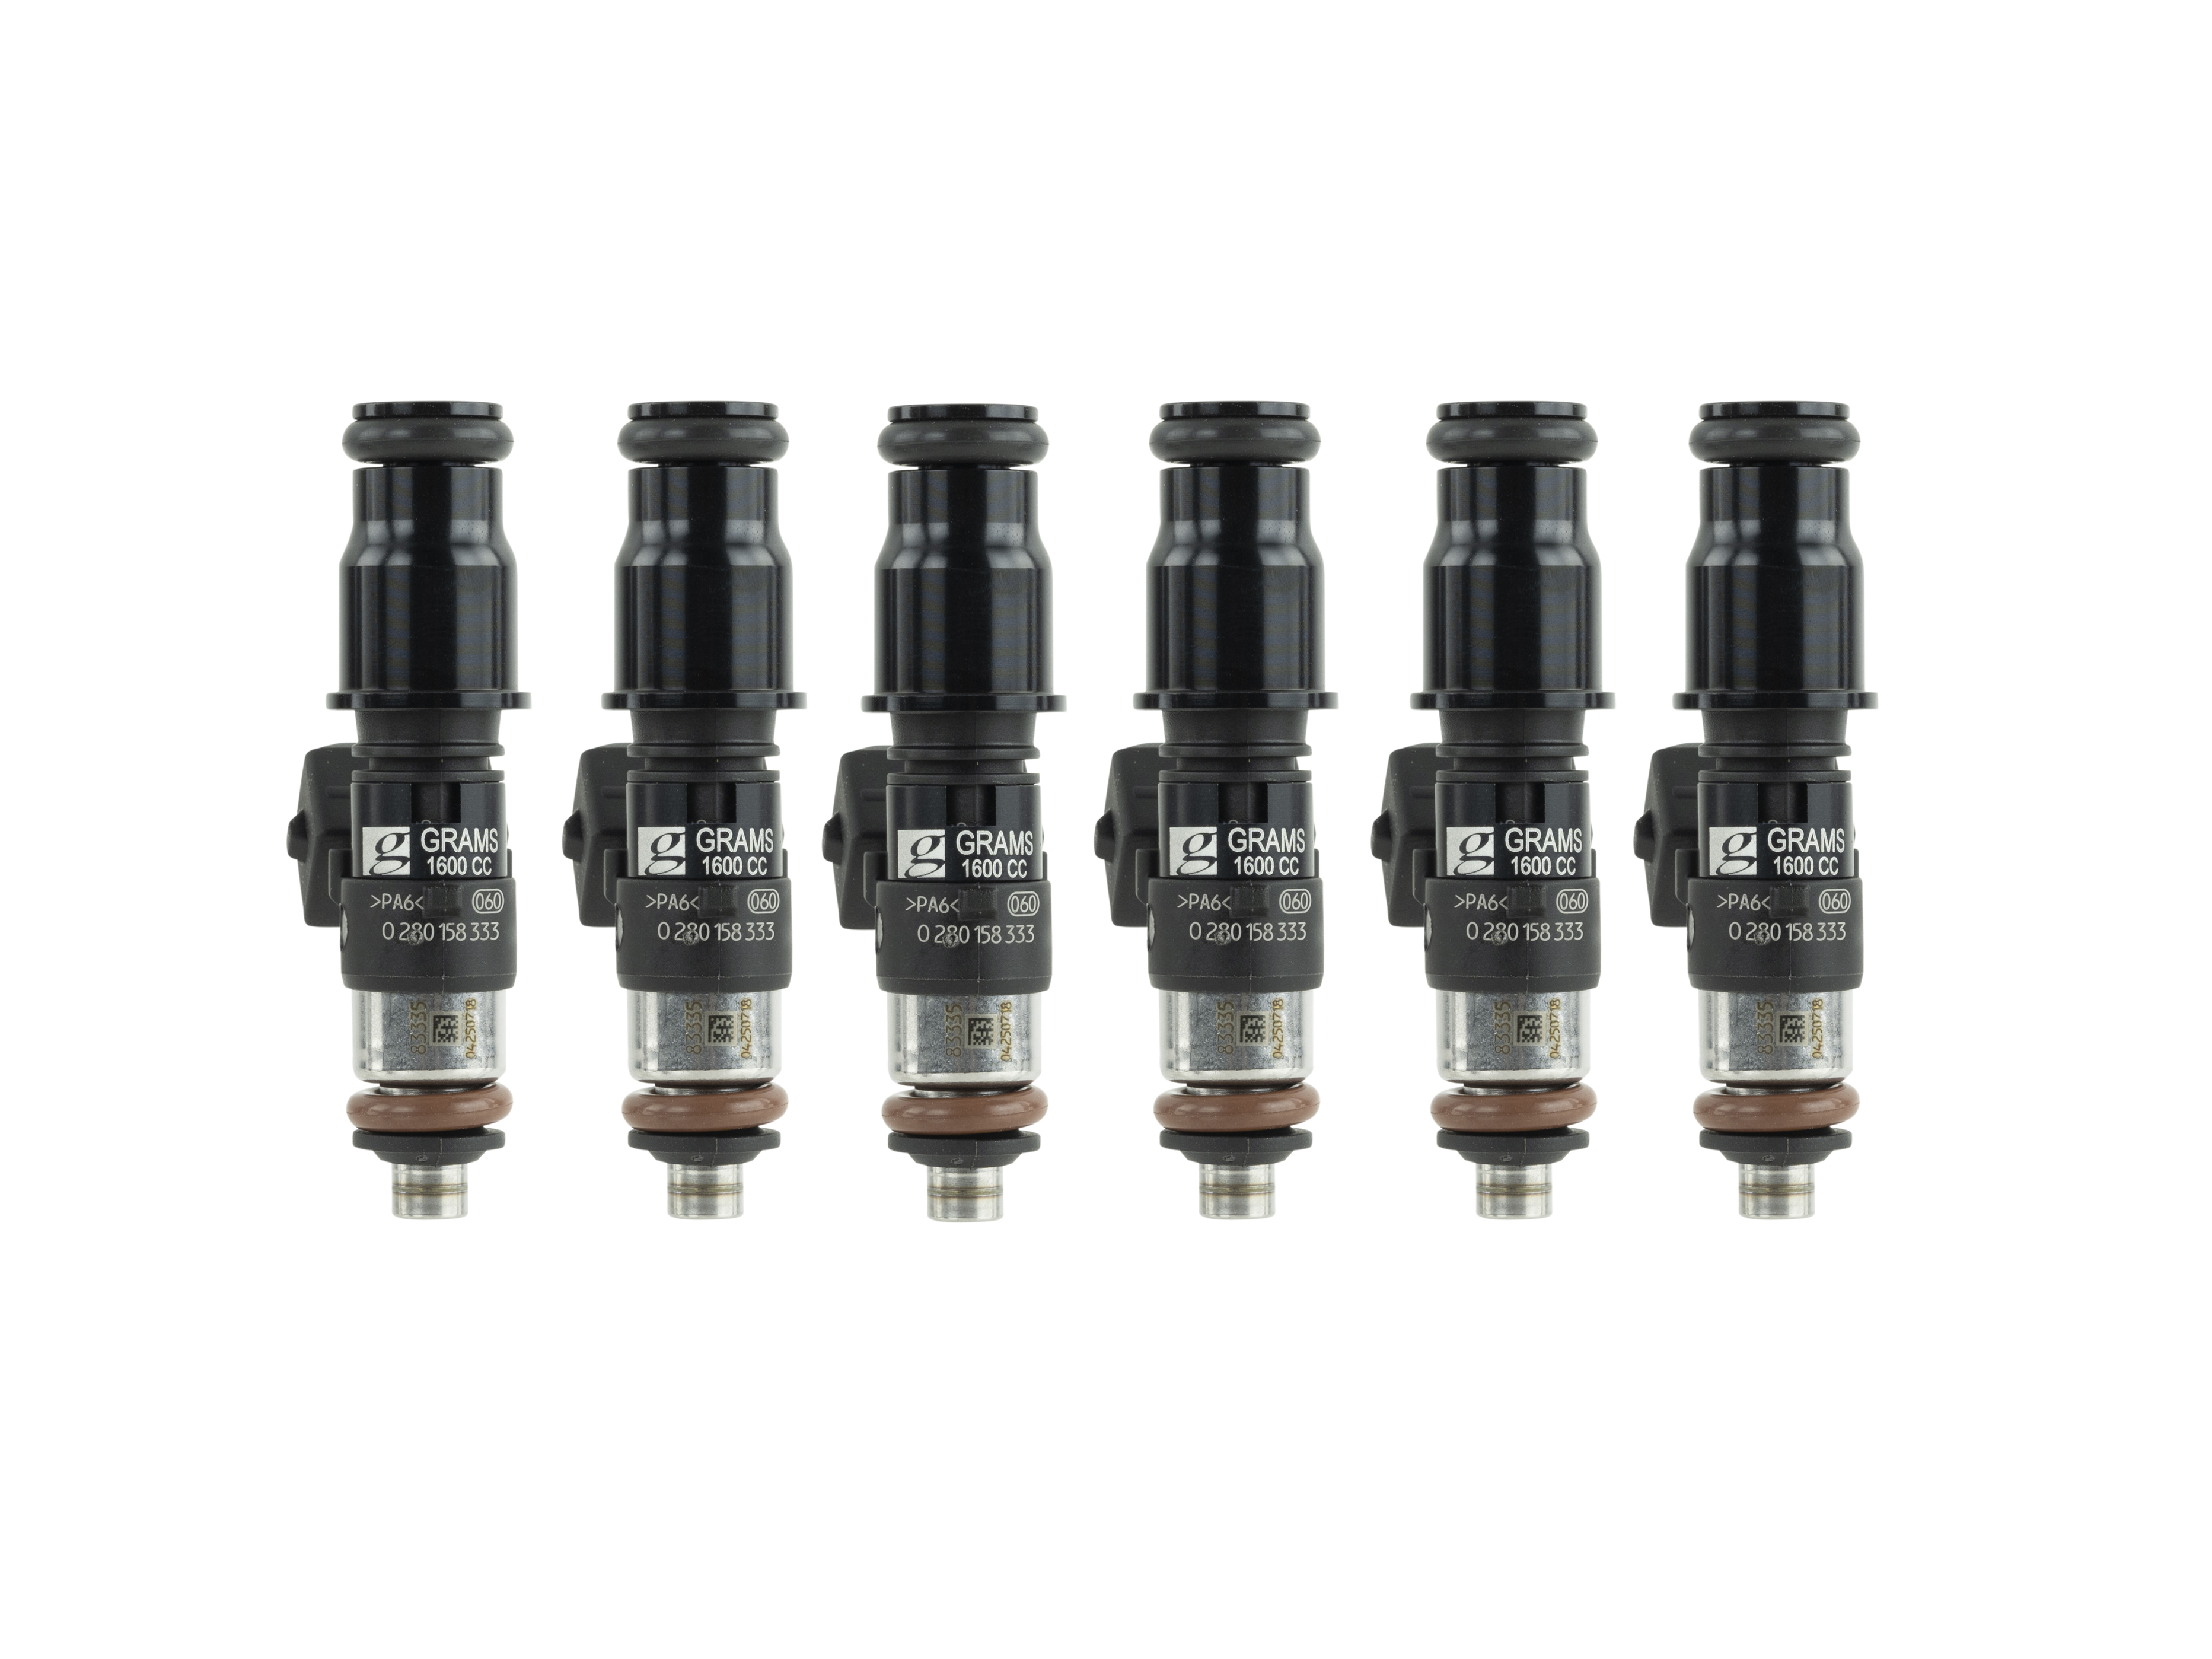 Grams Performance 99-04 Porsche 911 996 3.4L / 05-12 Porsche 911 997 3.6L 1600c 149 lbs/hr Injector Kit G2-1600-1300